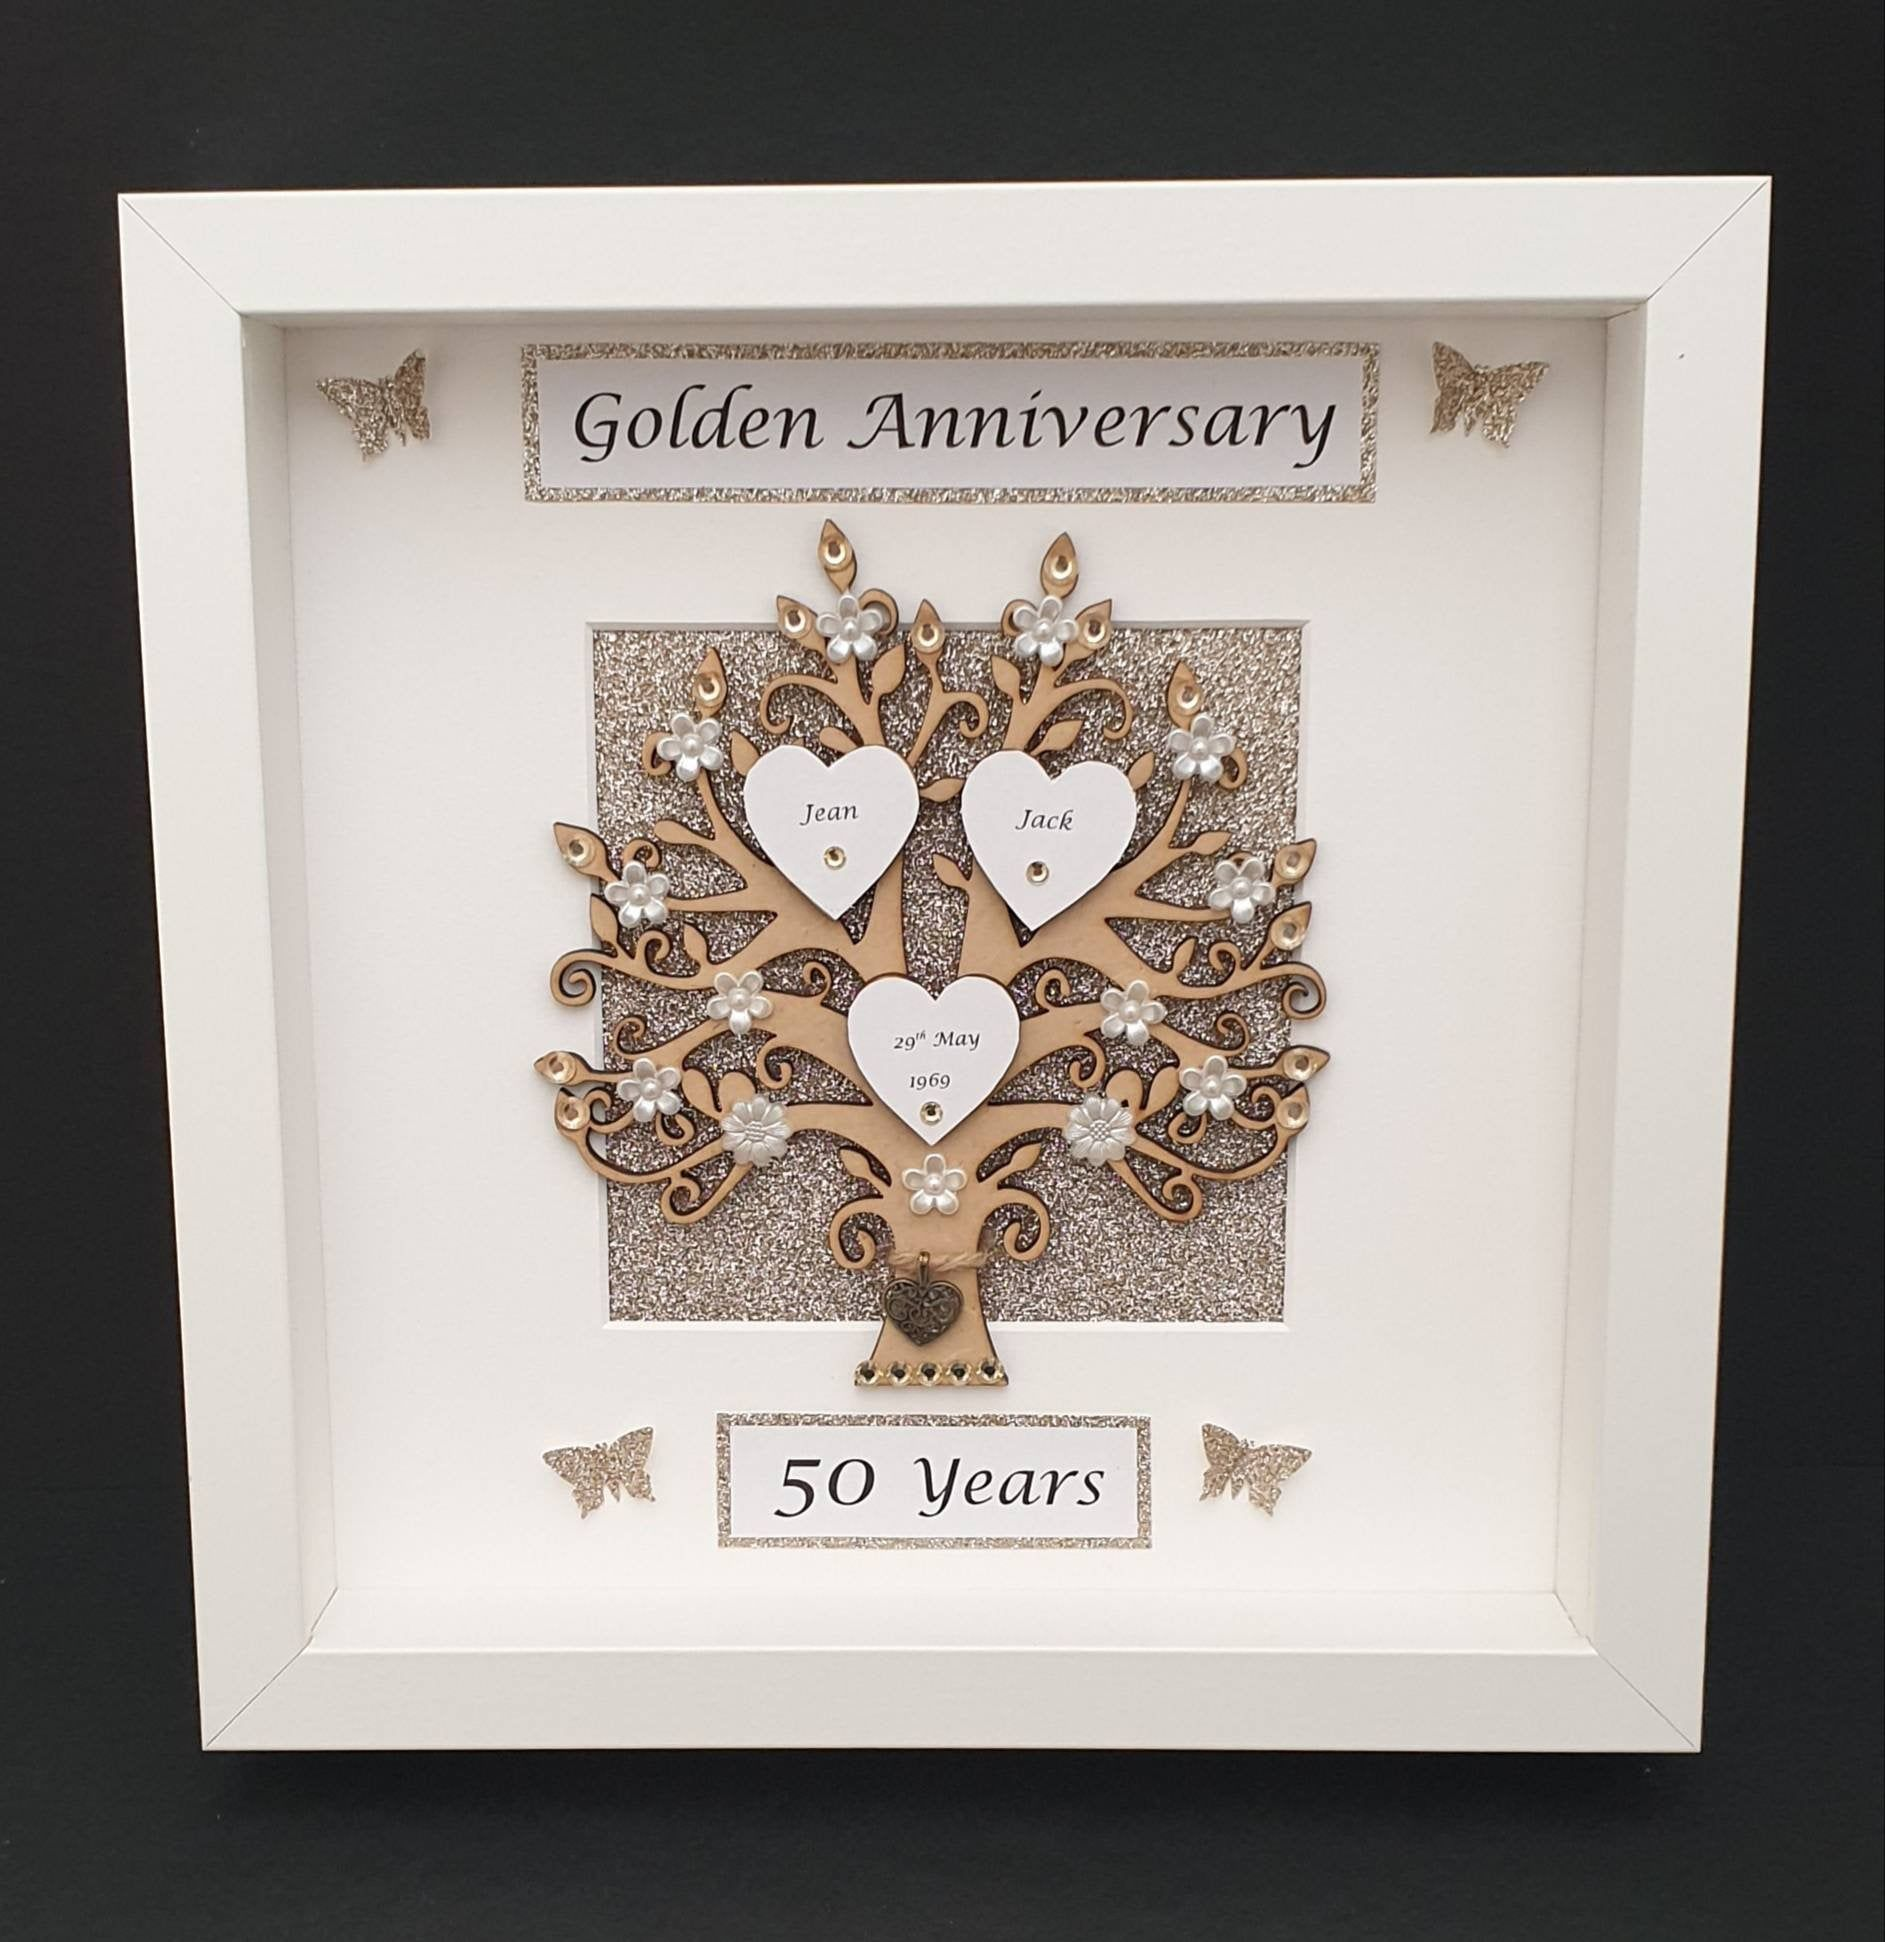 50th golden wedding anniversary frame keepsake gift